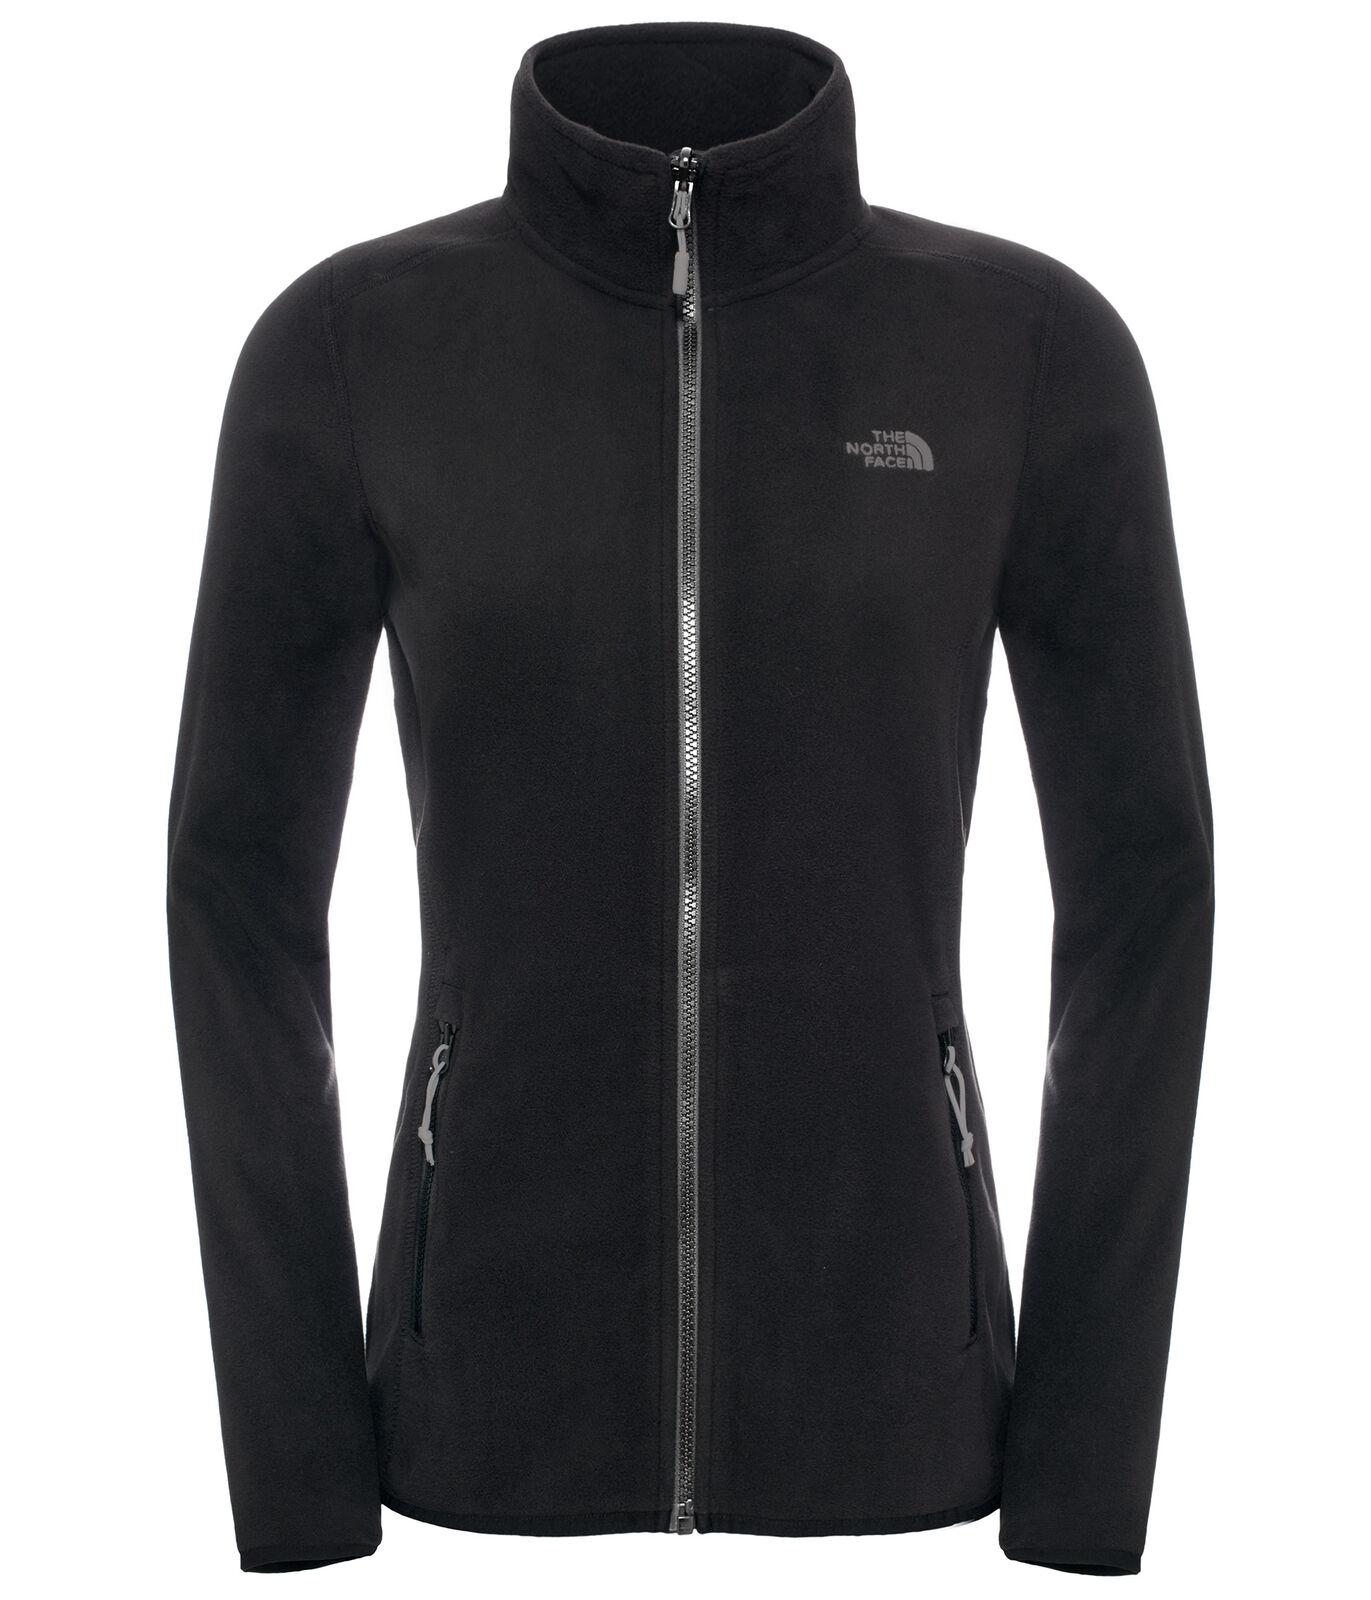 online store 9c224 0d6fd The North Face Women 100 Glacier Full Zip Jacke Damen ...